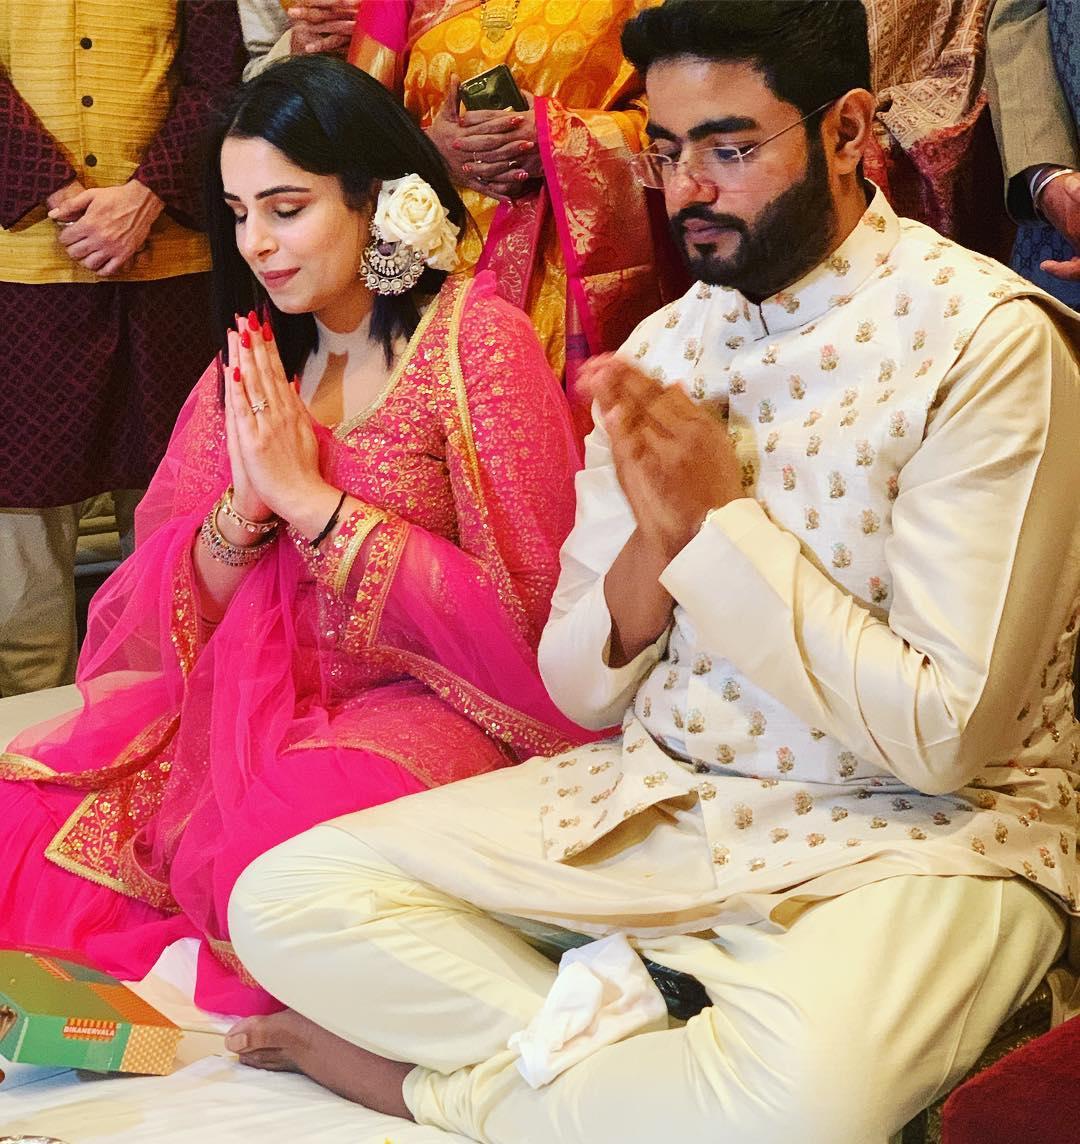 Siddharth Chopra and Ishita Kumar